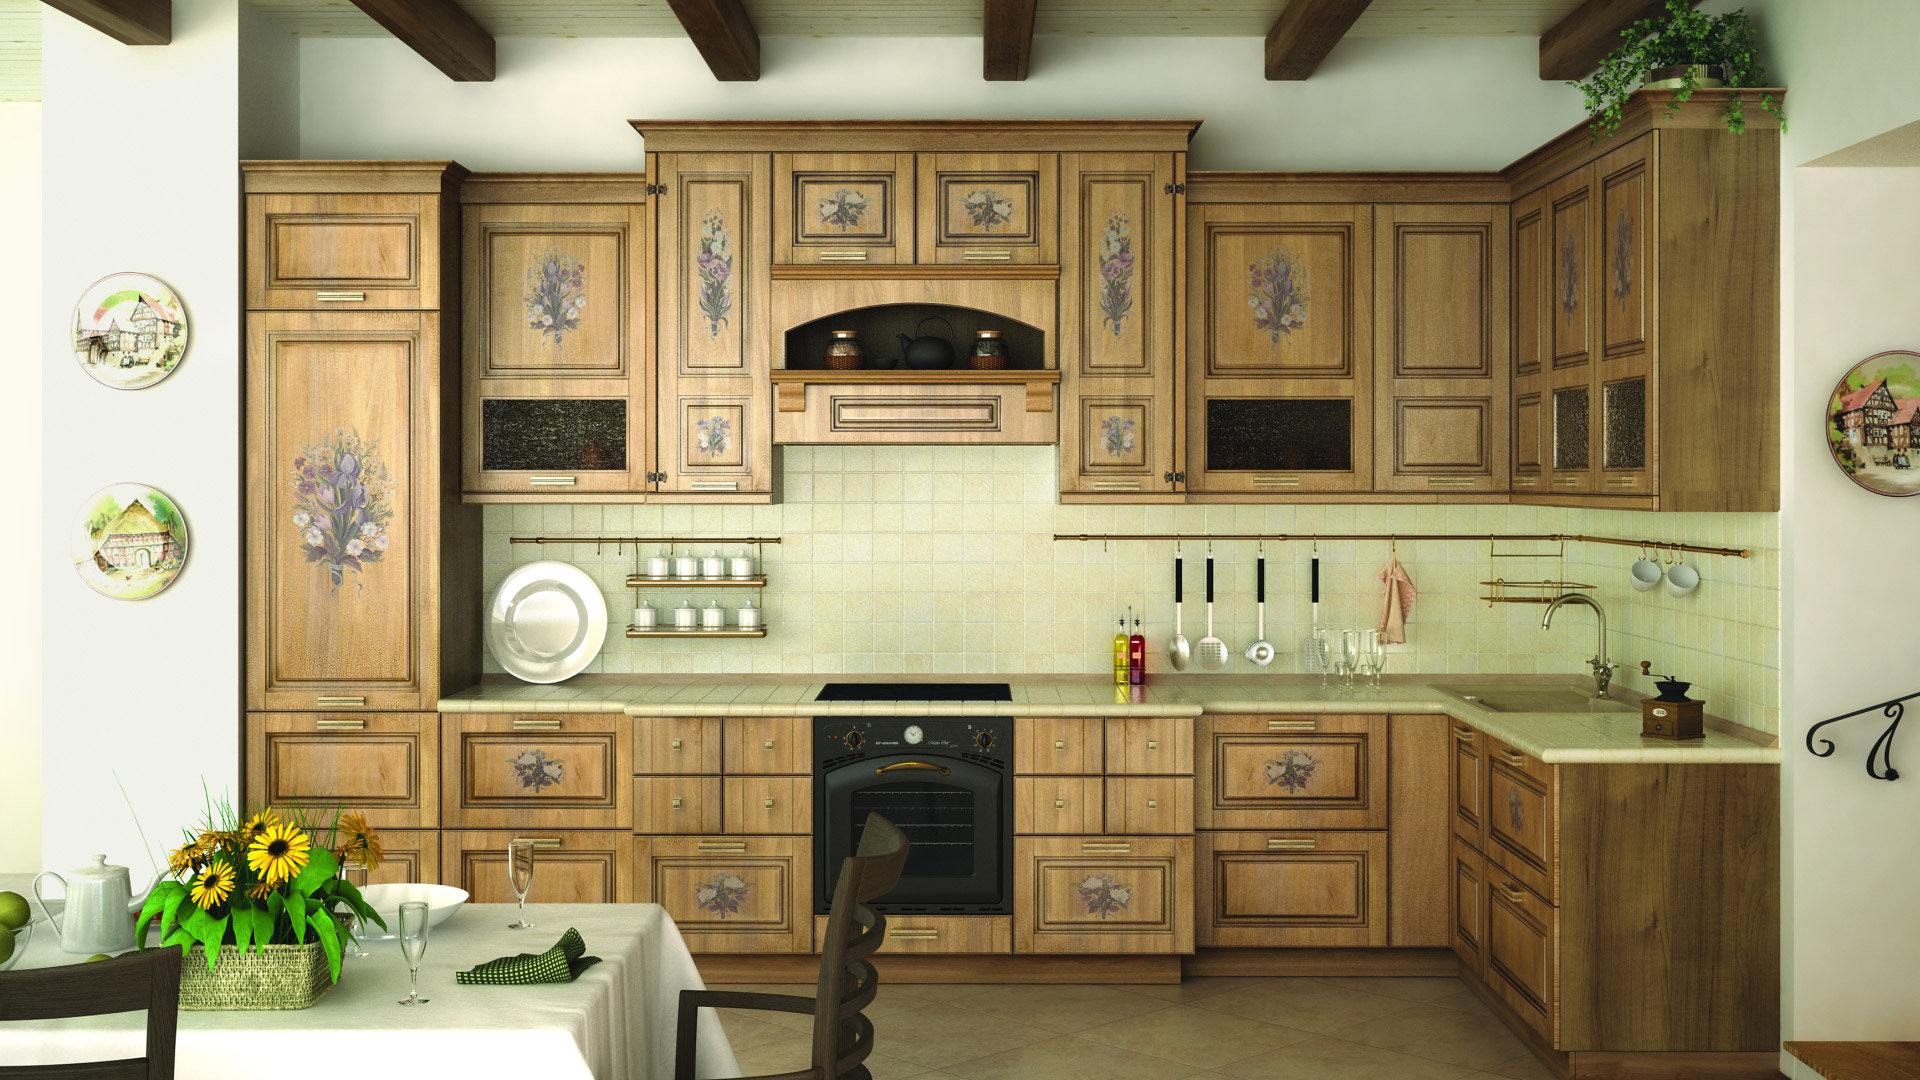 Декор кухонного гарнитура своими руками фото